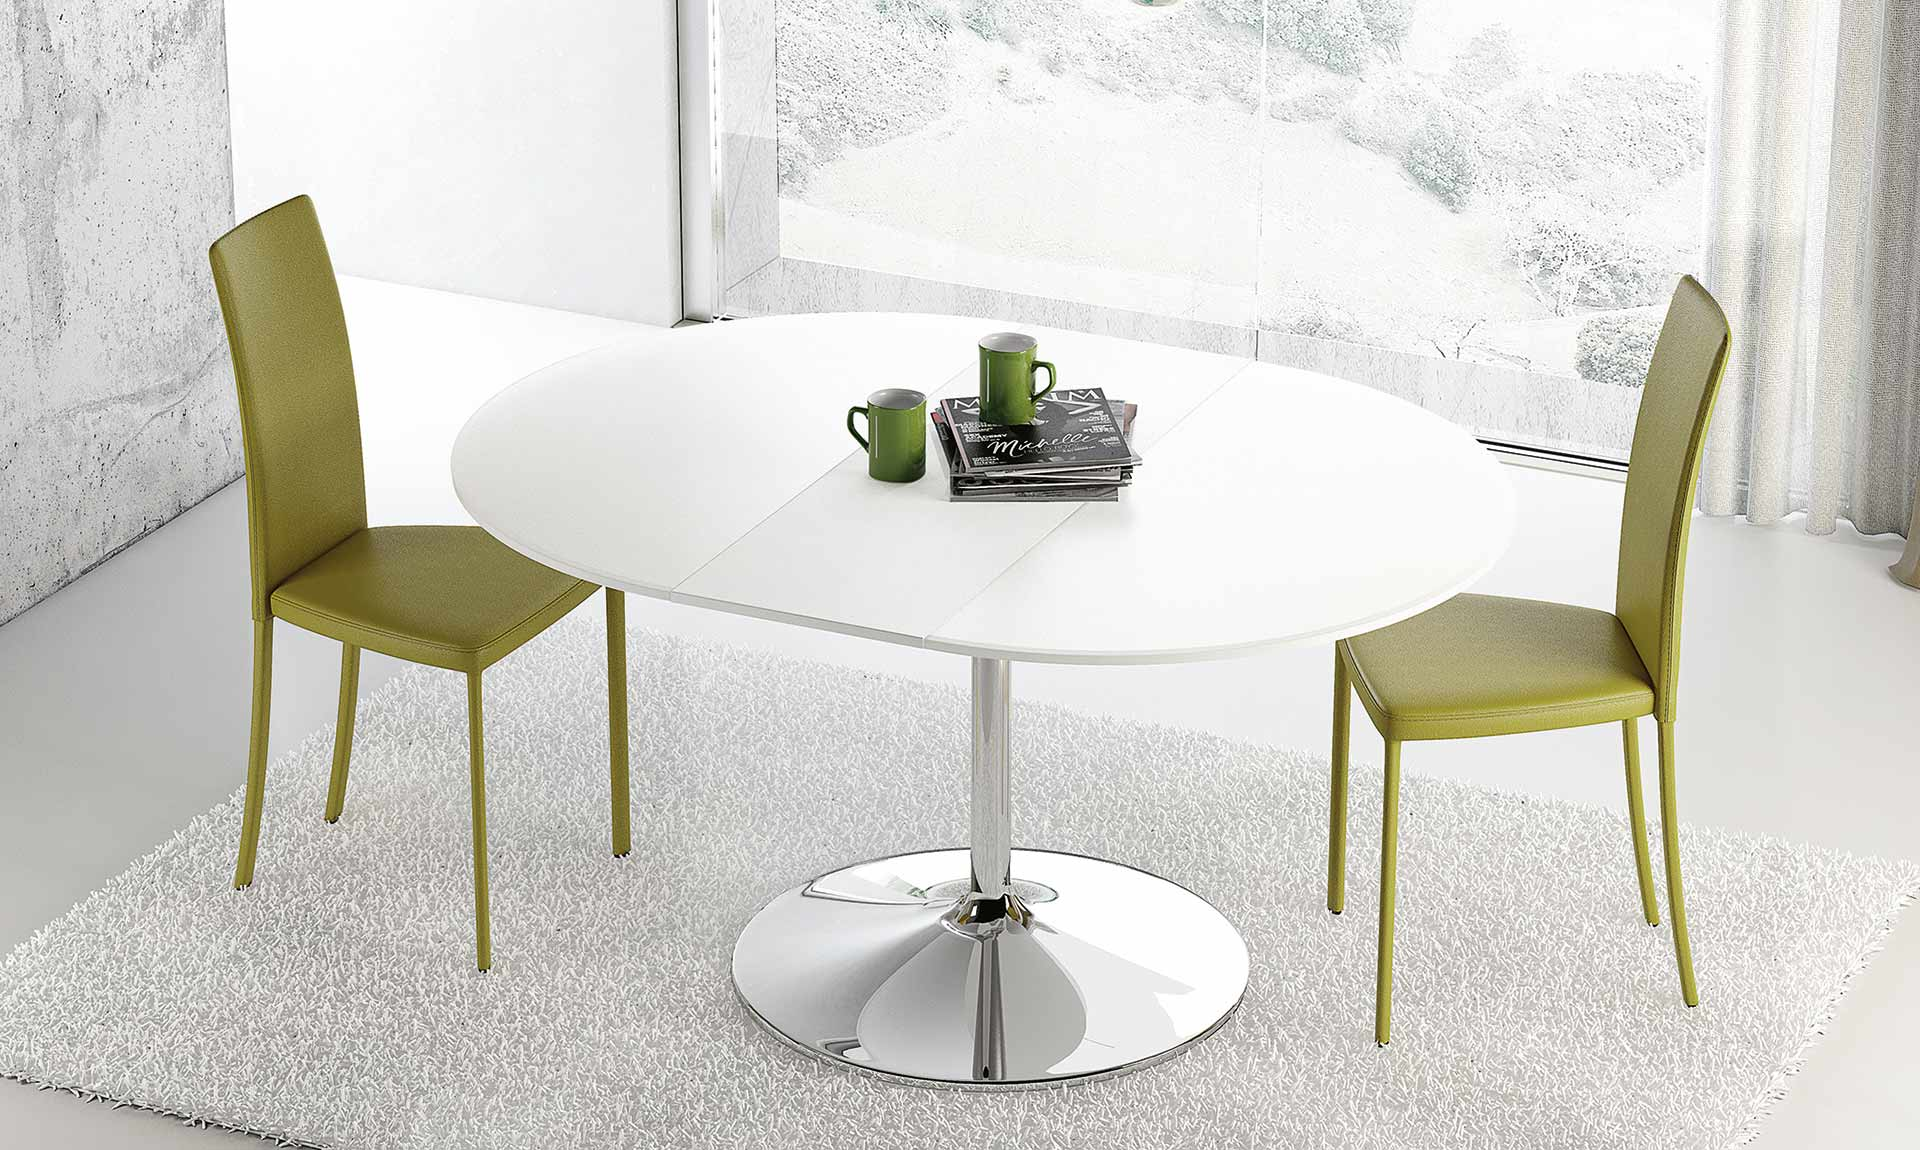 Sedia colorata slim meroni arreda - Tavoli da pranzo classici ...